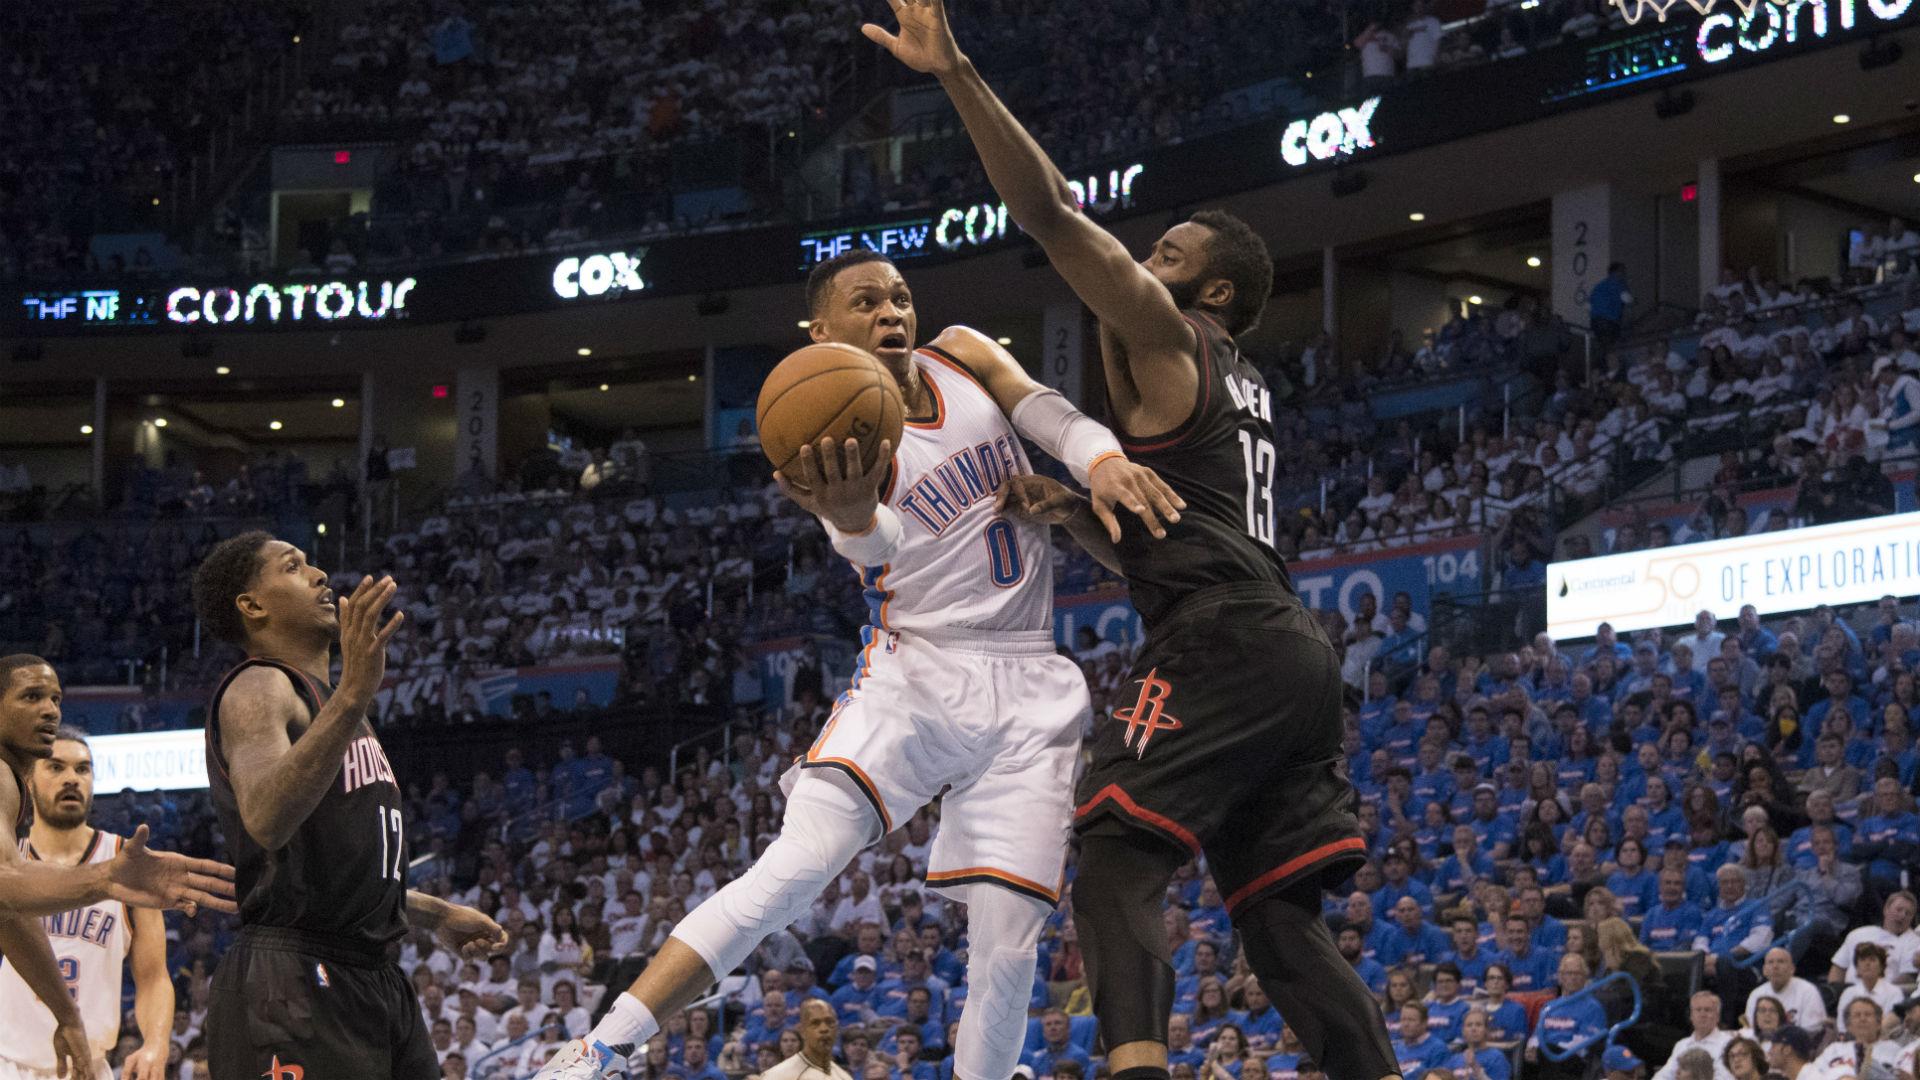 NBA roundup: Rockets rally, take 2-0 series lead